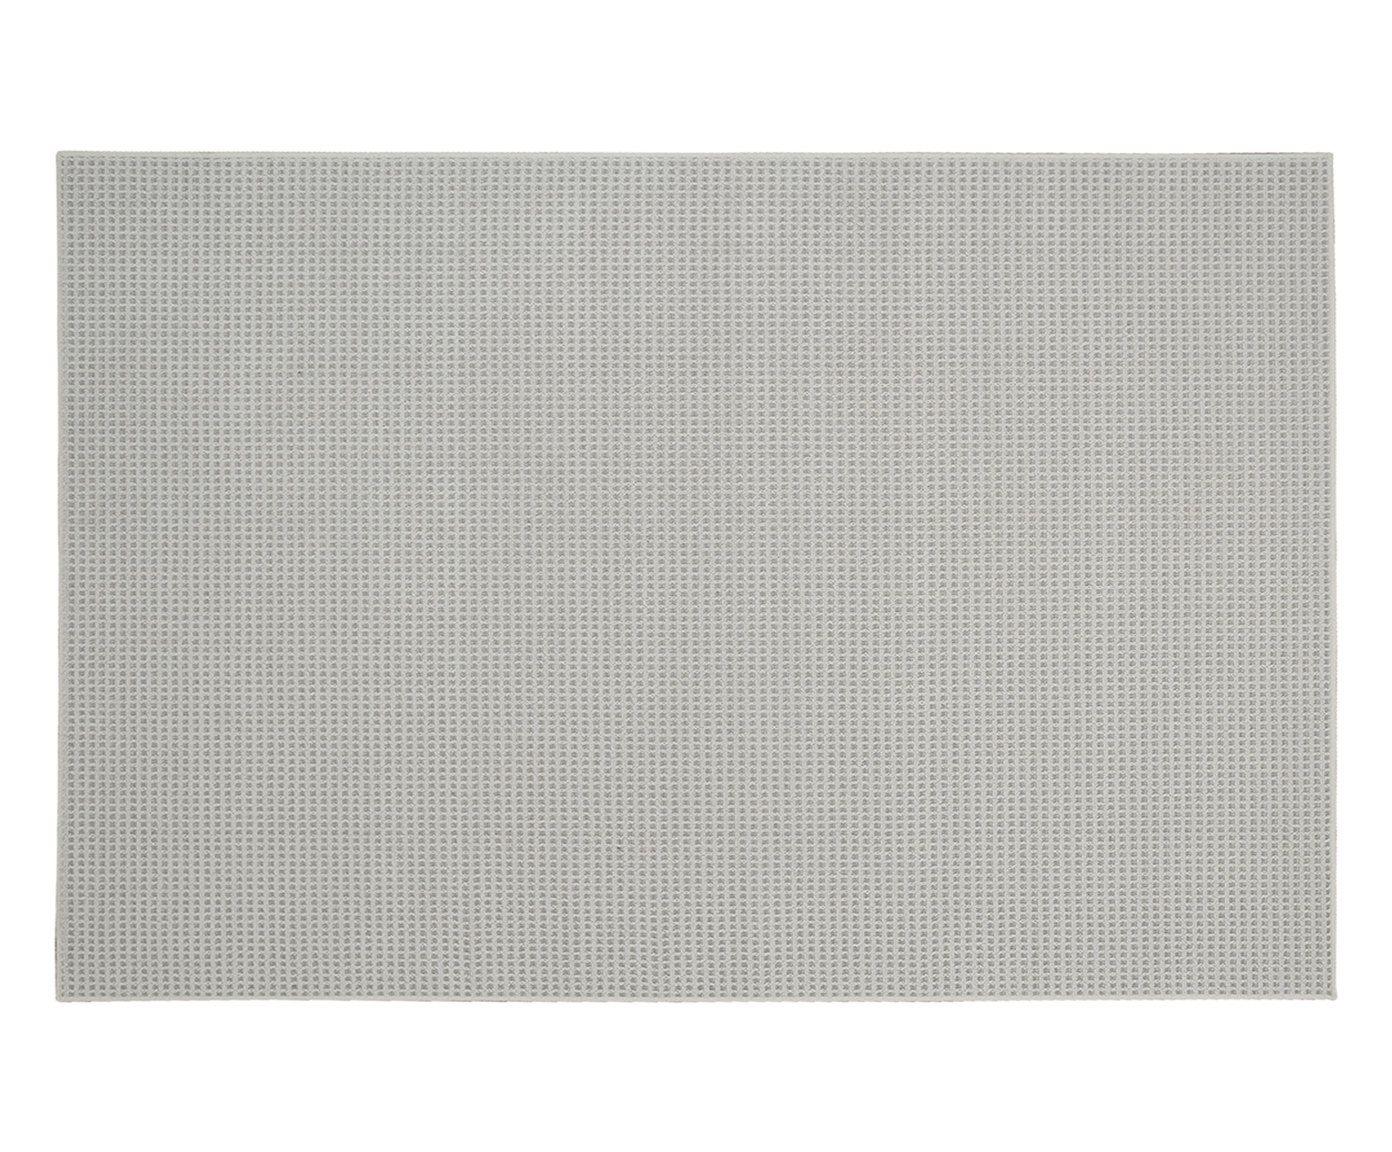 Tapete Cotton Cru - 240X340cm | Westwing.com.br